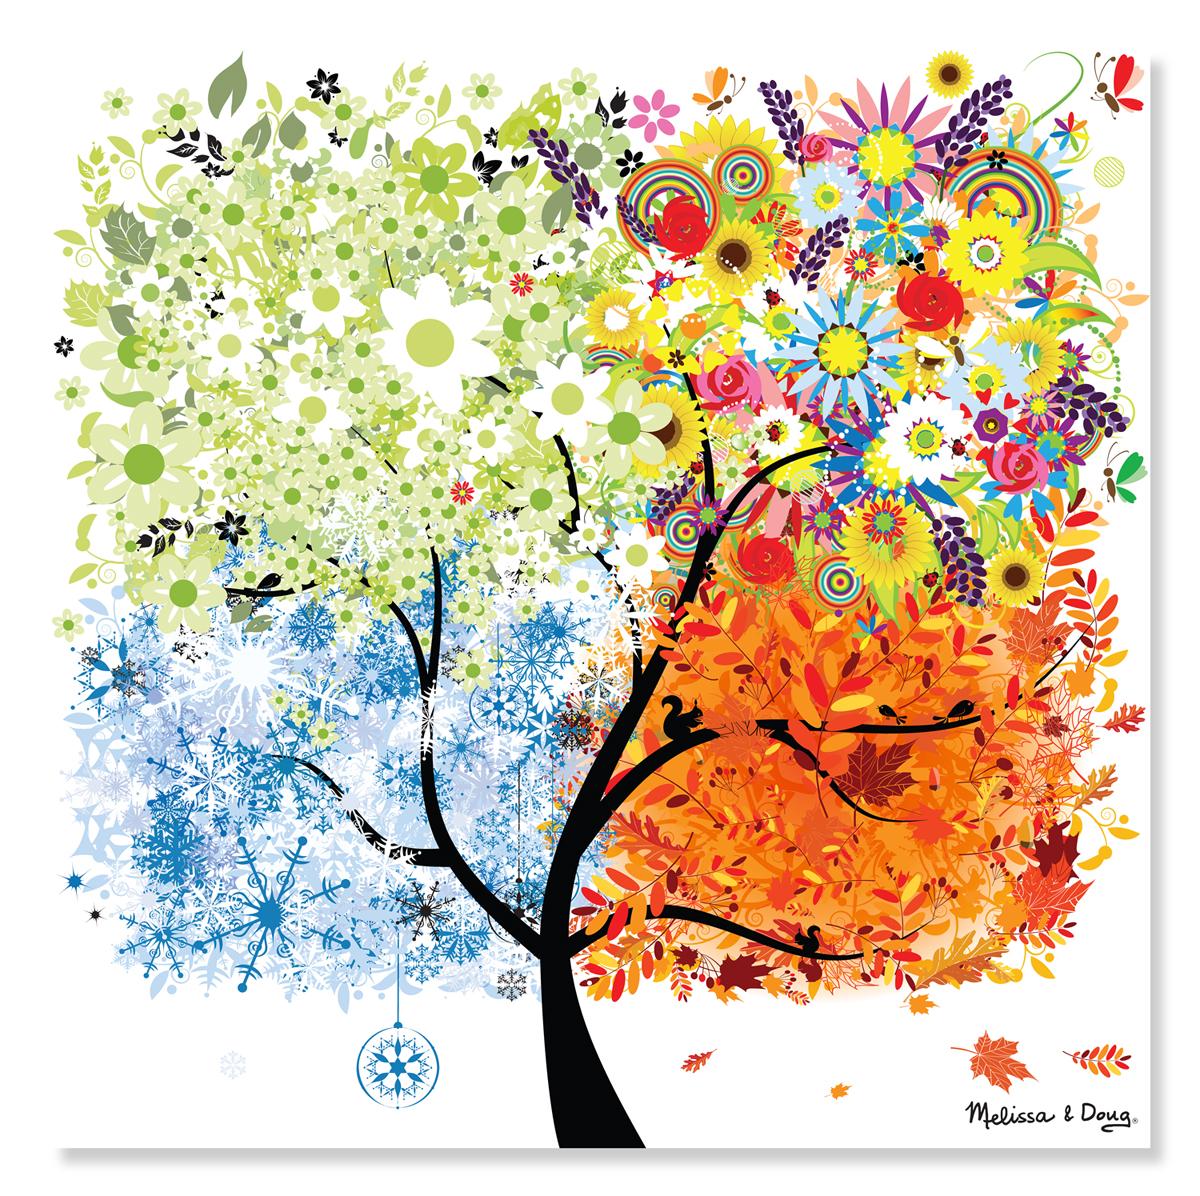 Melissa & Doug - Seasons Tree Cardboard Jigsaw - 200 Pieces